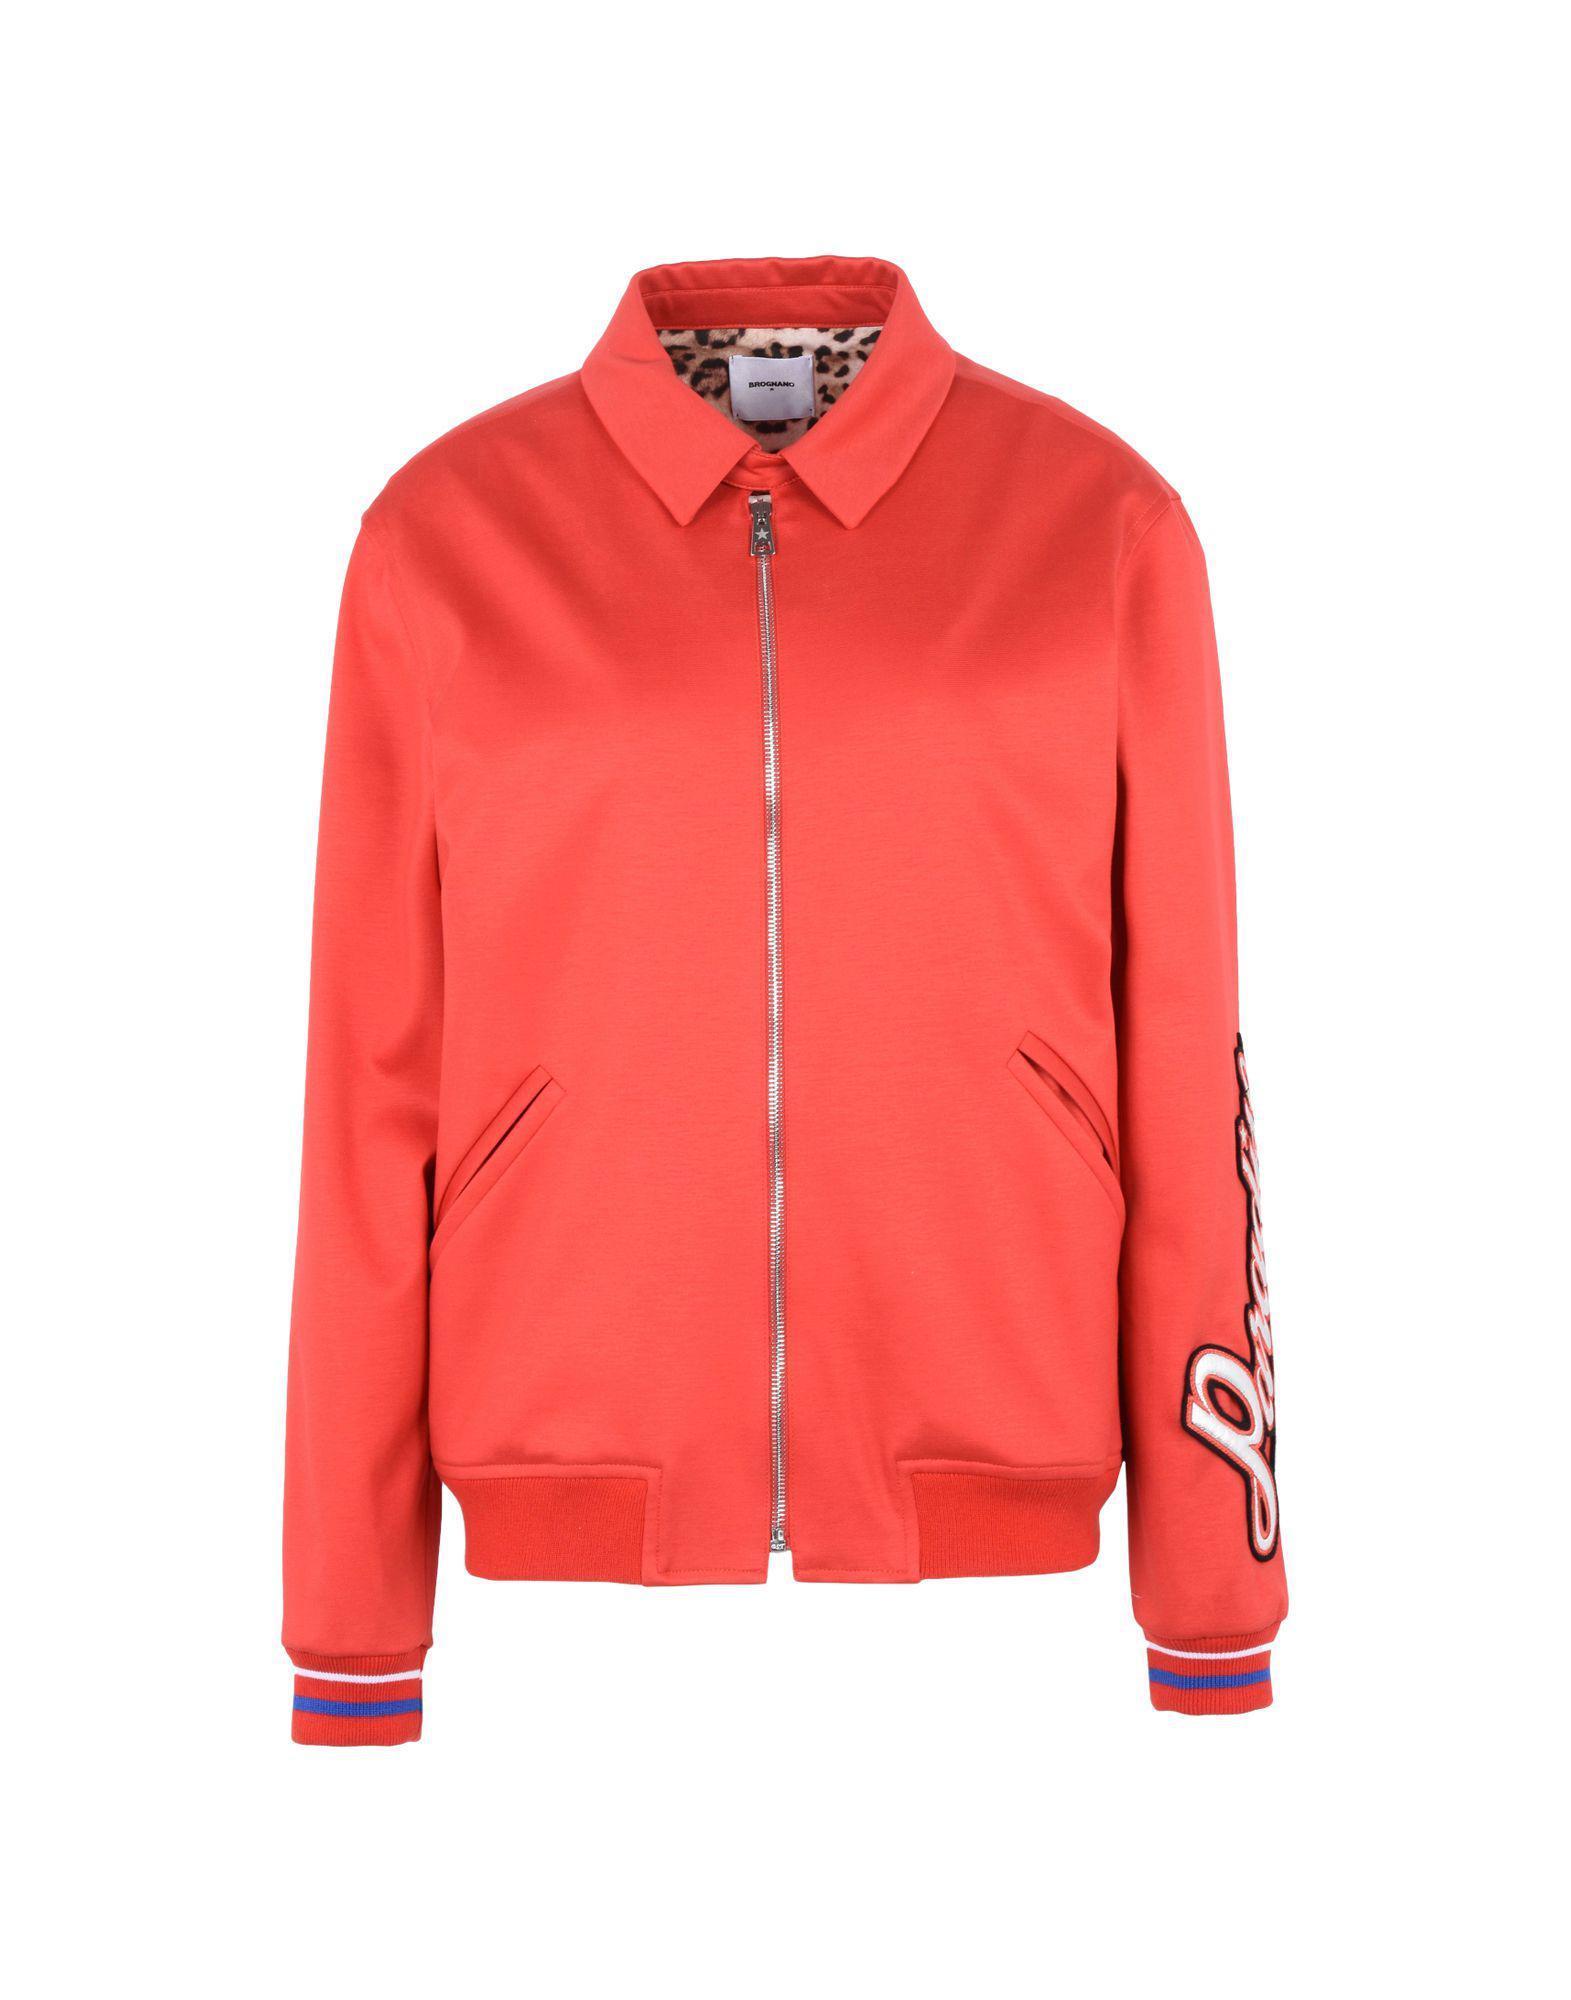 COATS & JACKETS - Jackets Brognano Free Shipping Collections cYTyuOKu